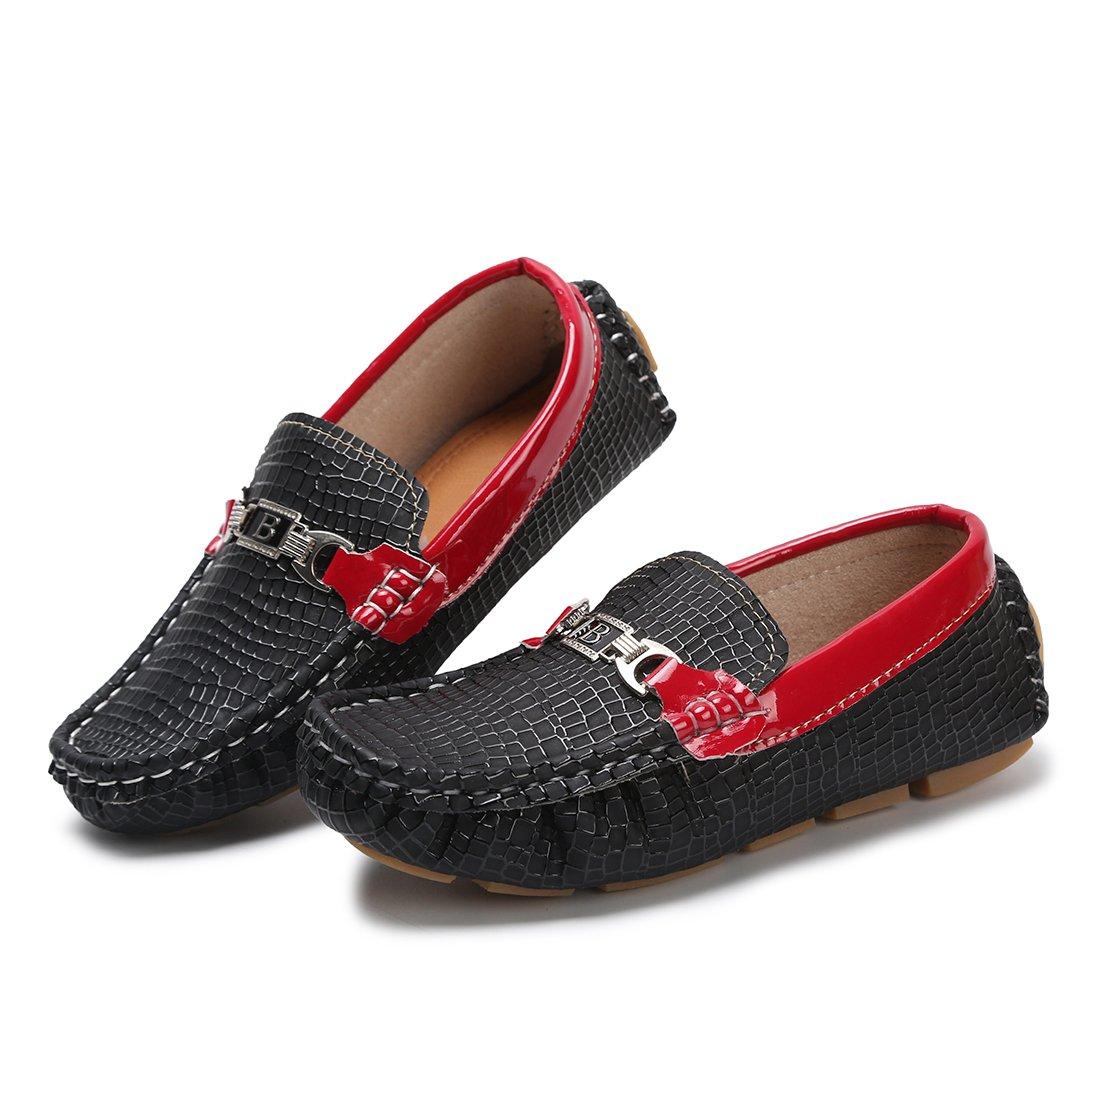 Hawkwell Kids Loafer Moccasin Oxford Driver Shoes(Toddler/Little Kid/Big Kid),Black PU,8 M US